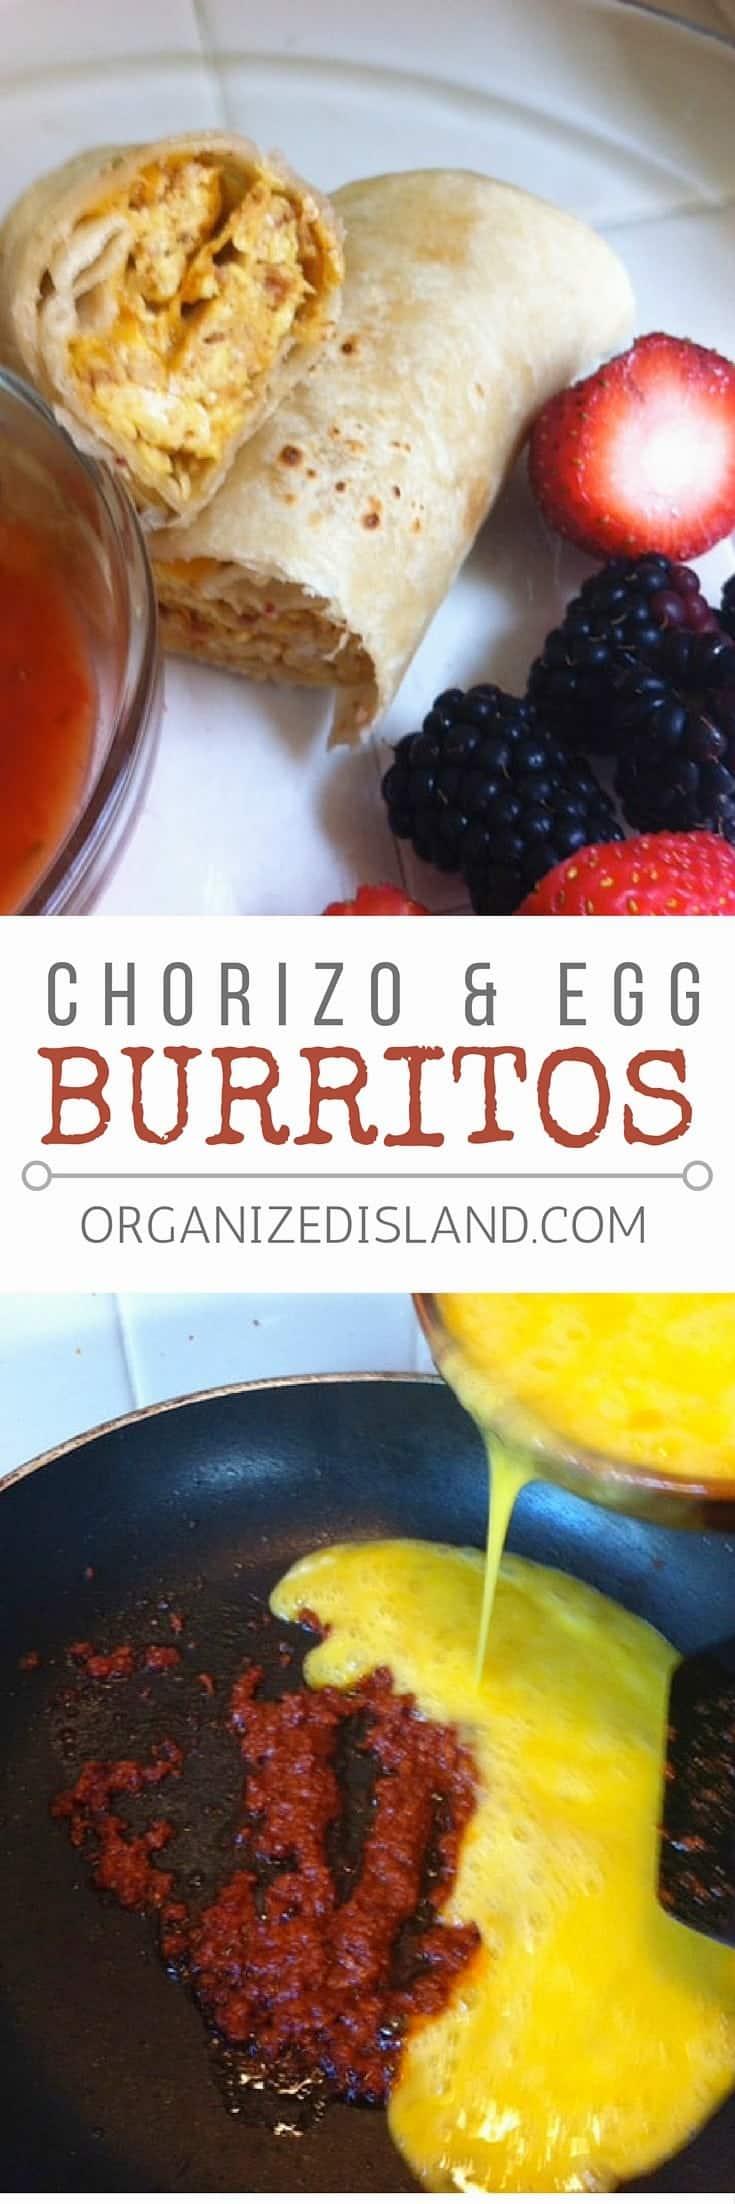 mood for breakfast burritos? Try my chorizo and egg breakfast burrito ...